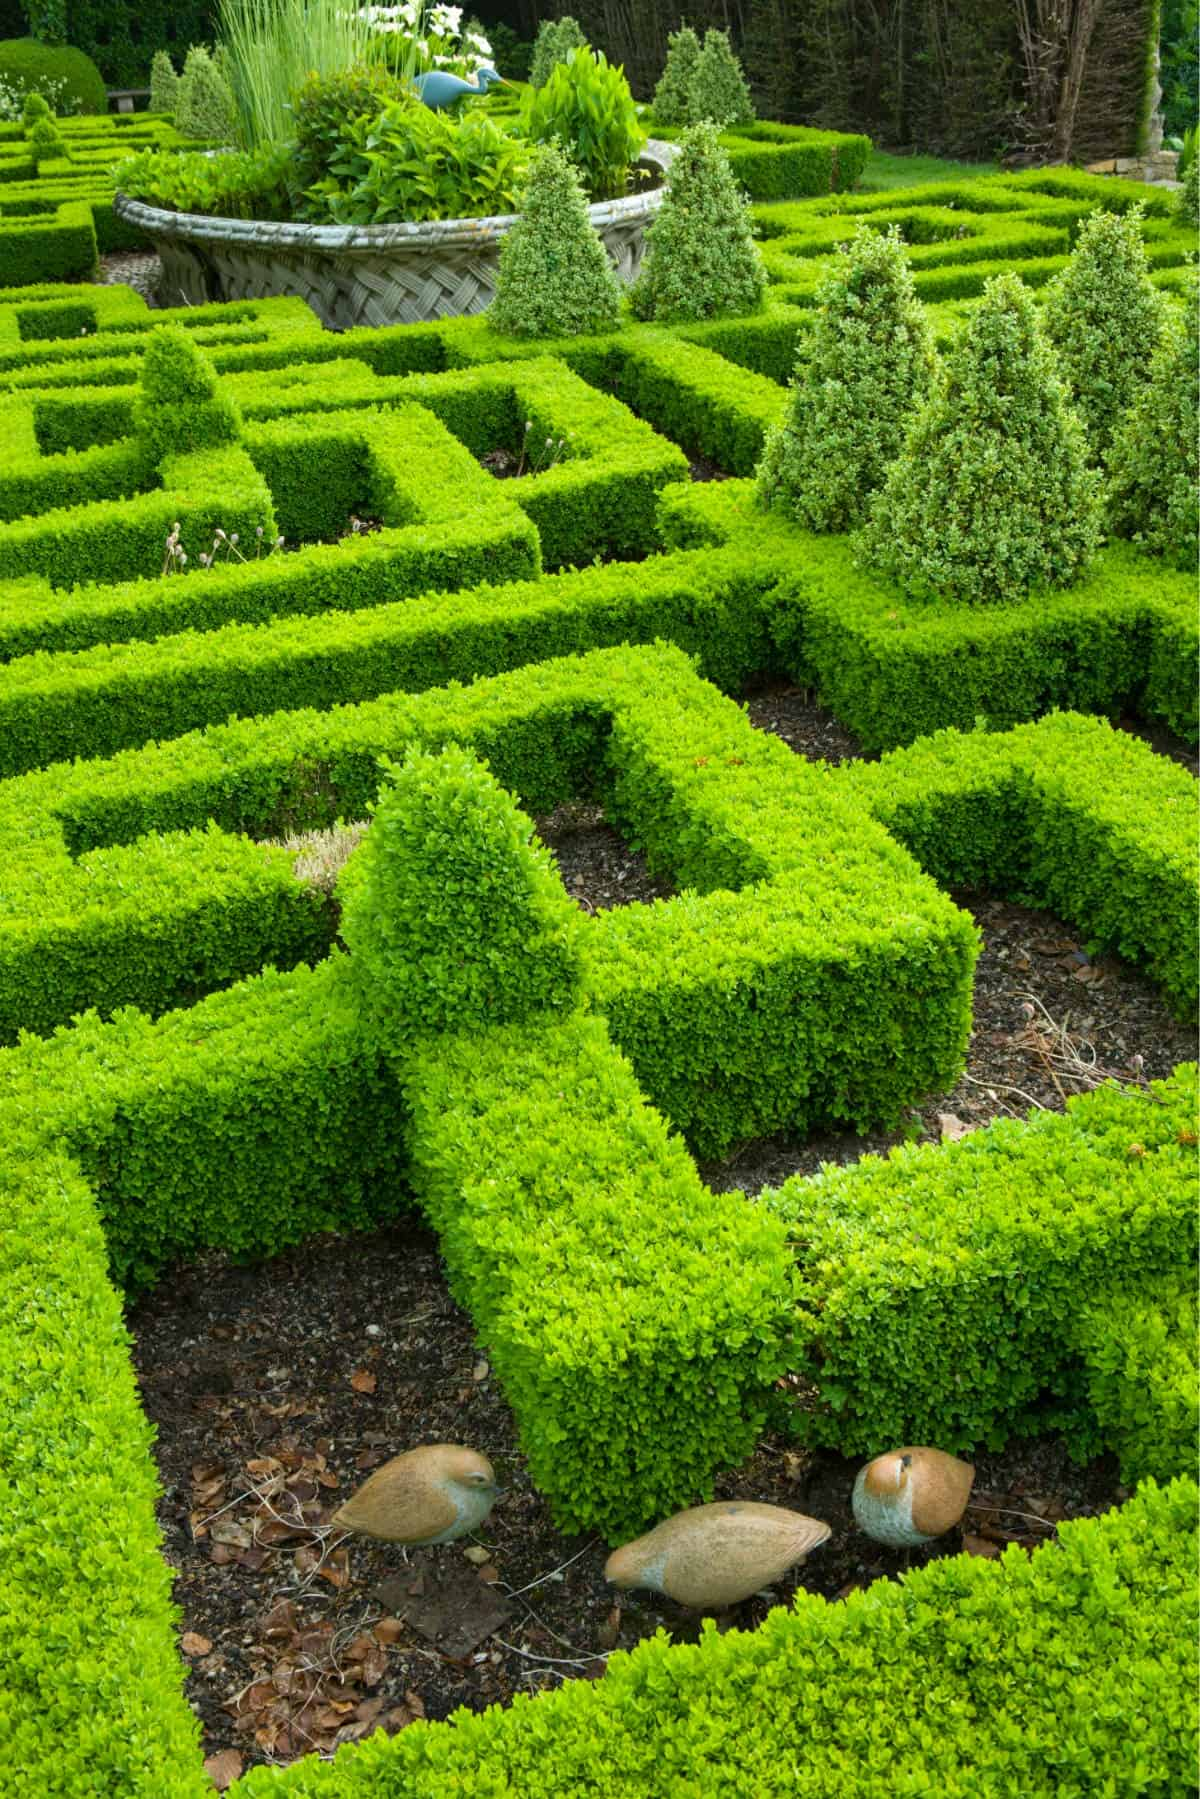 Maze-style boxwood knot garden